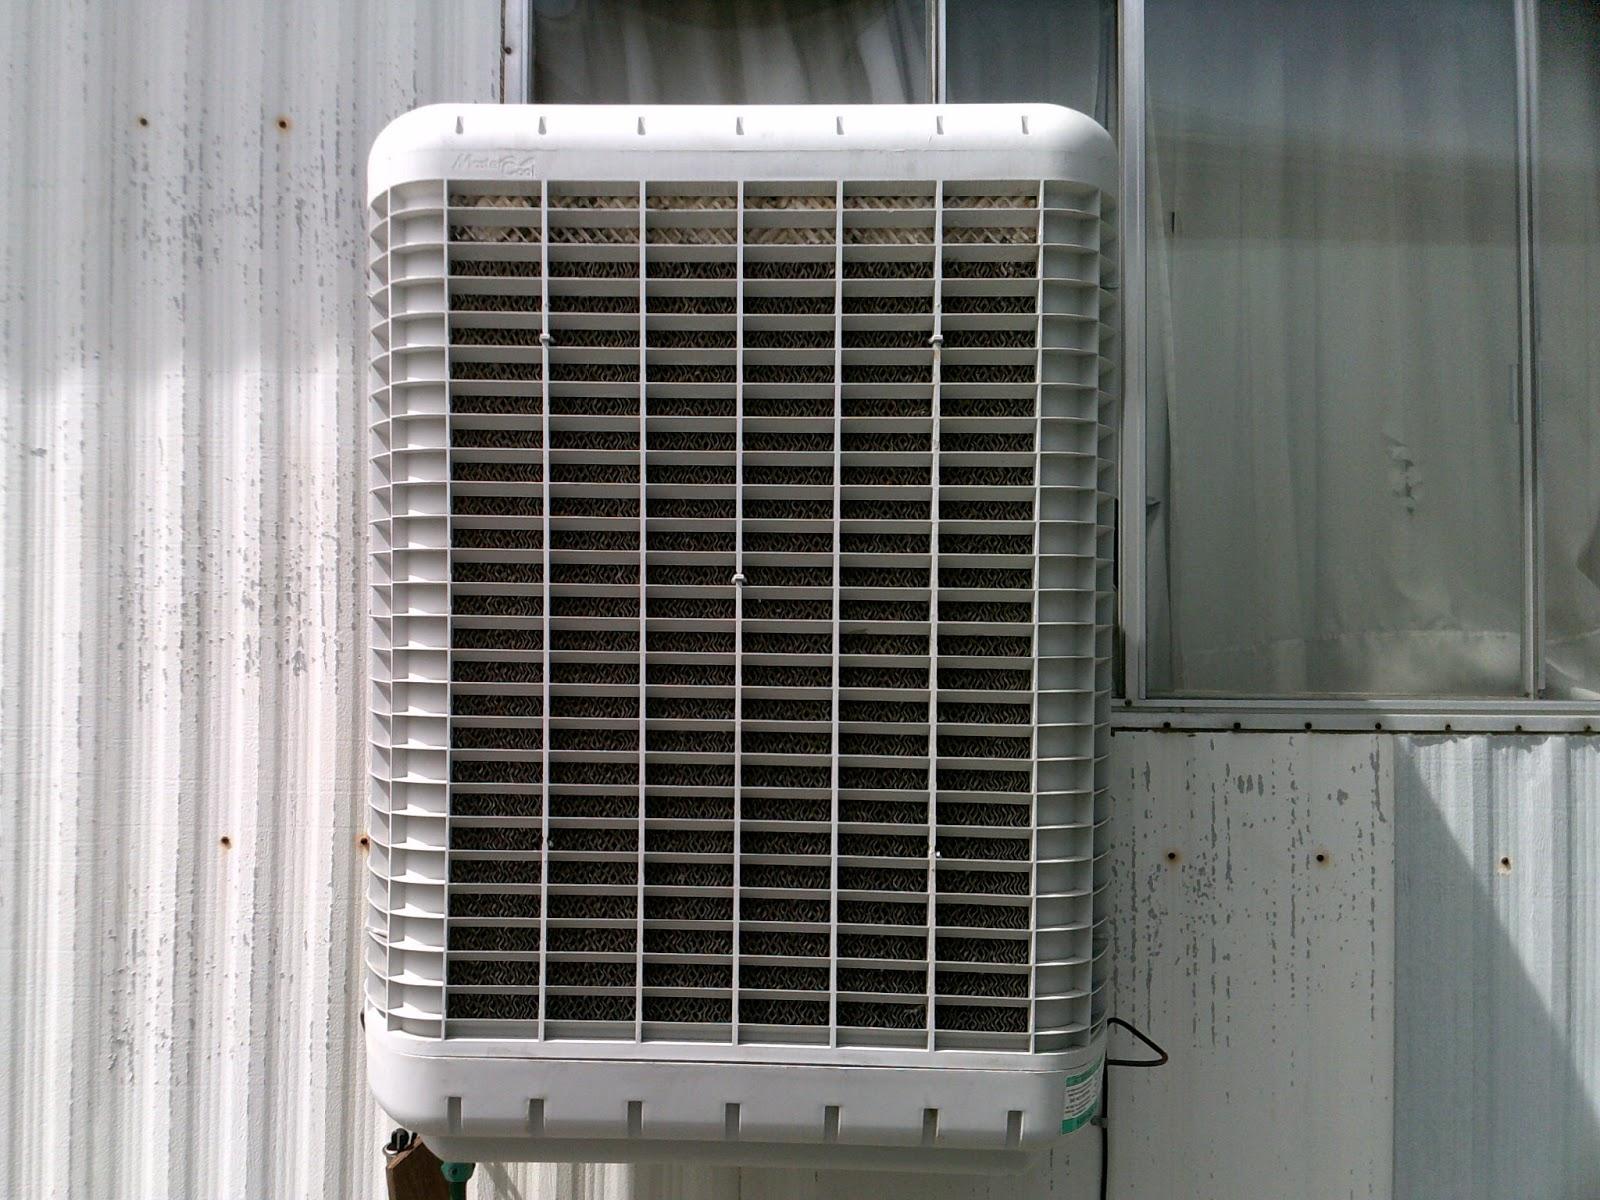 2018 Mastercool Evaporative Cooler Customer Review Negative Swamp Control Box Wiring Diagram Window